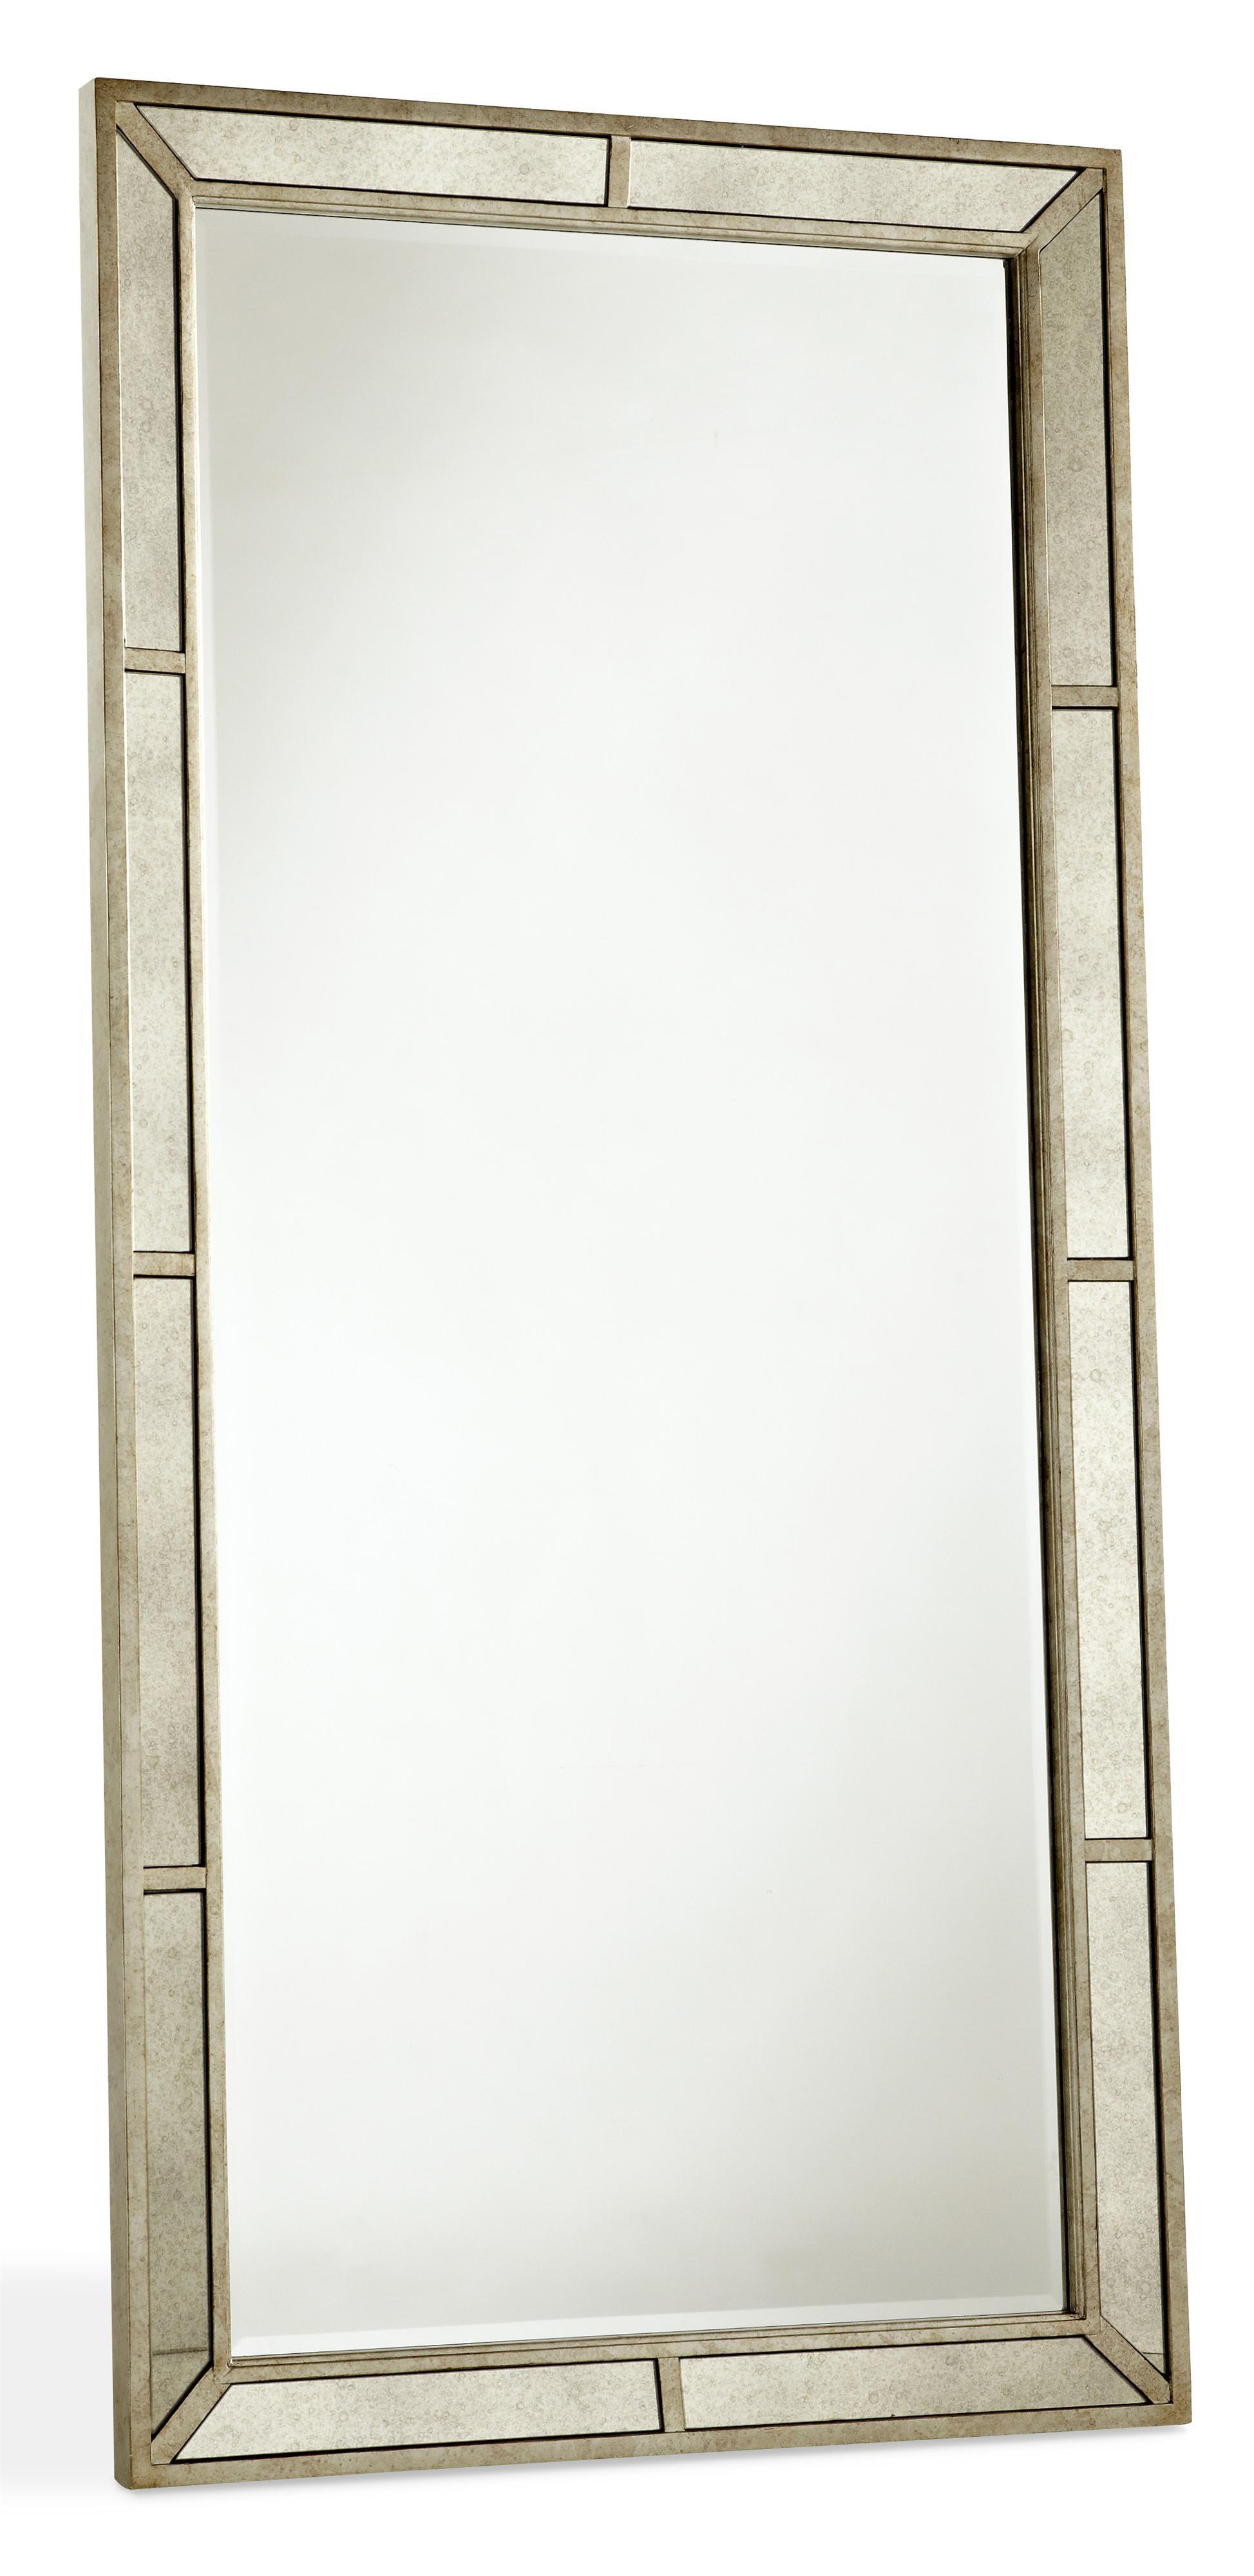 Pulaski Furniture Farrah Mirror - Item Number: 395112